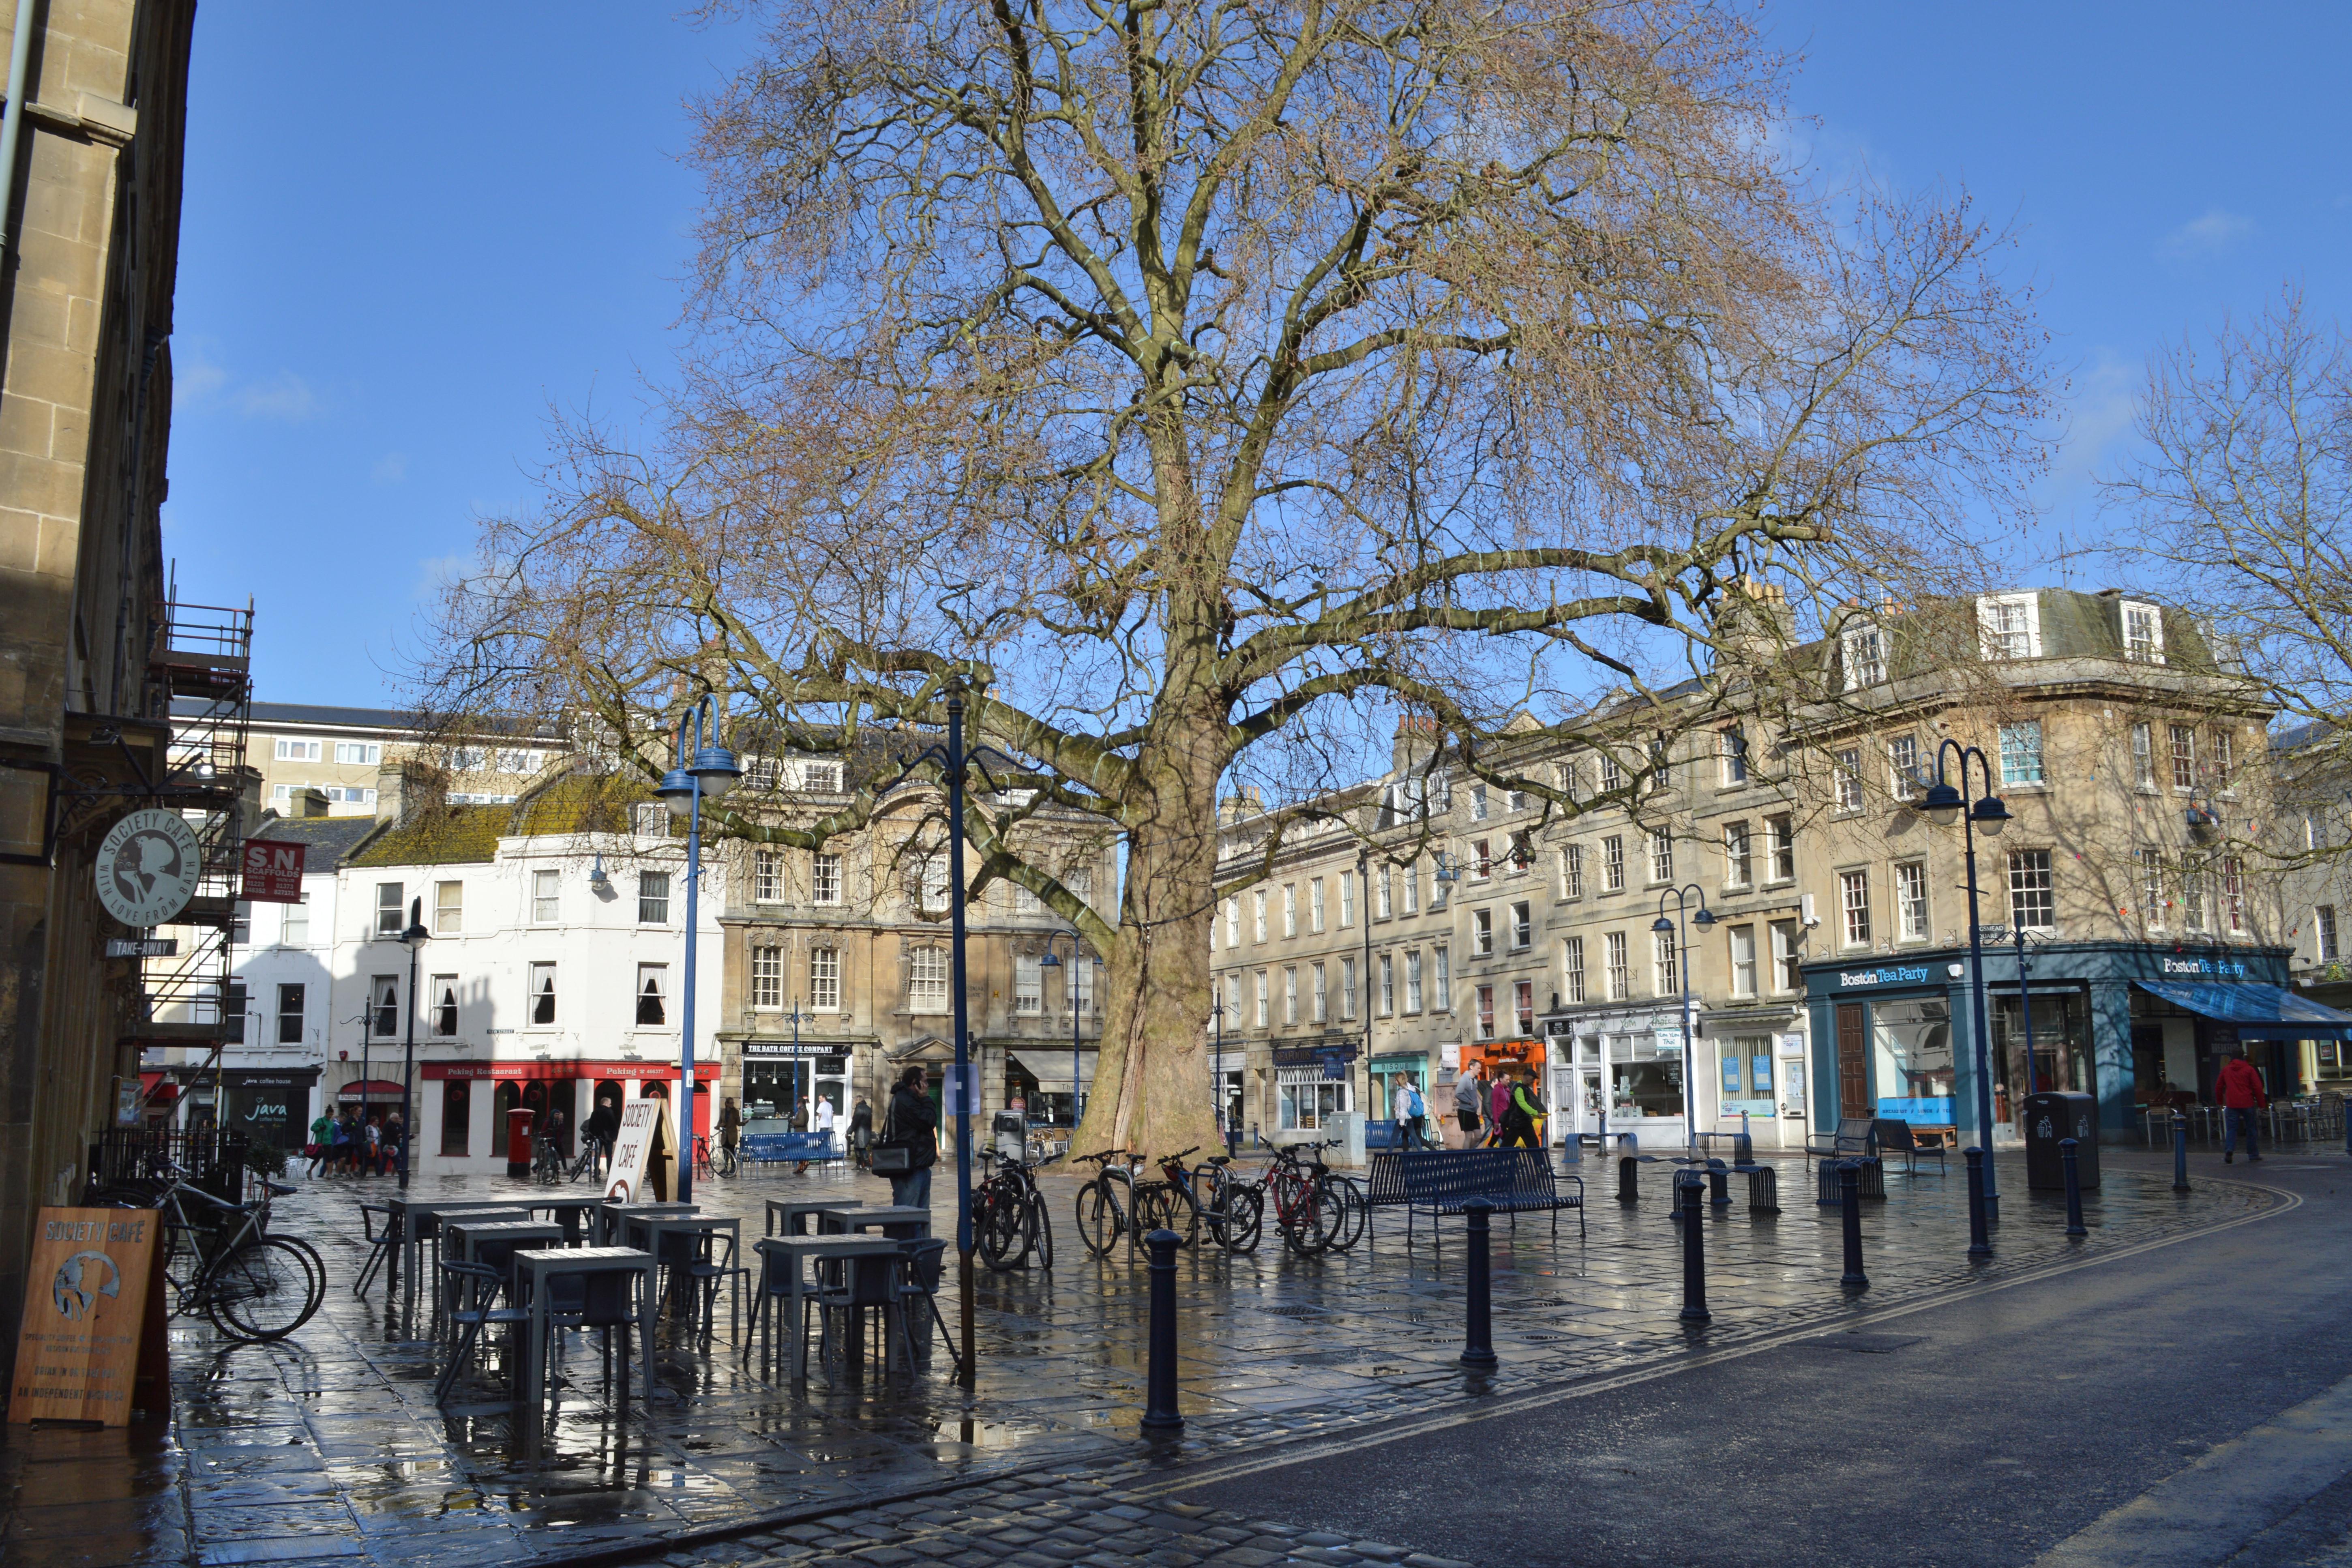 FileKingsmead Square Bath From South East